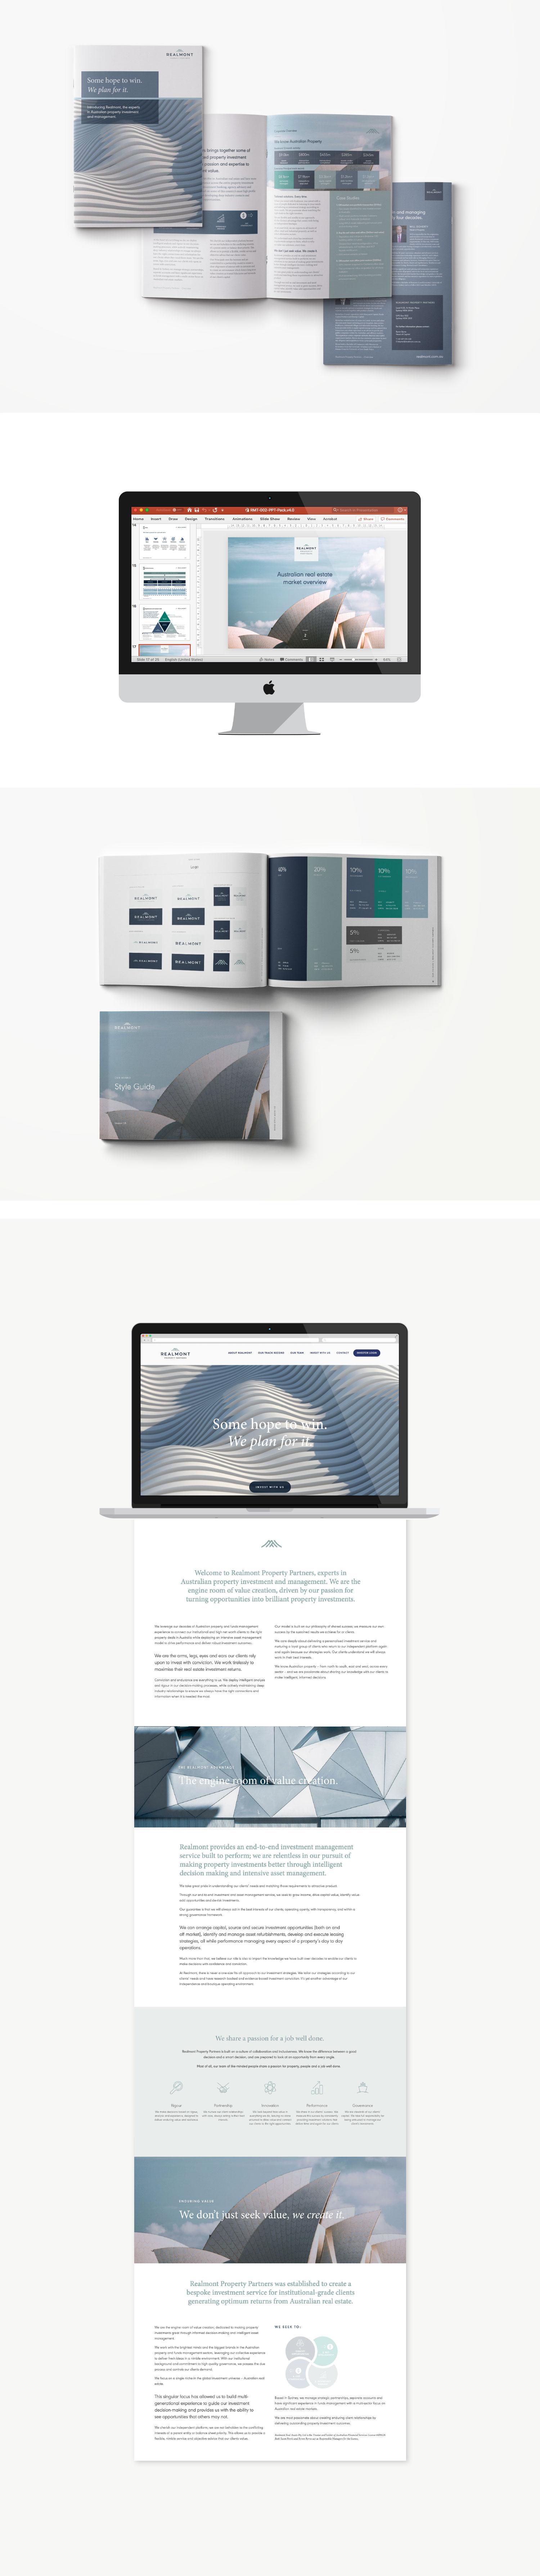 Realmont-Amadeus-Branding-Project.jpg